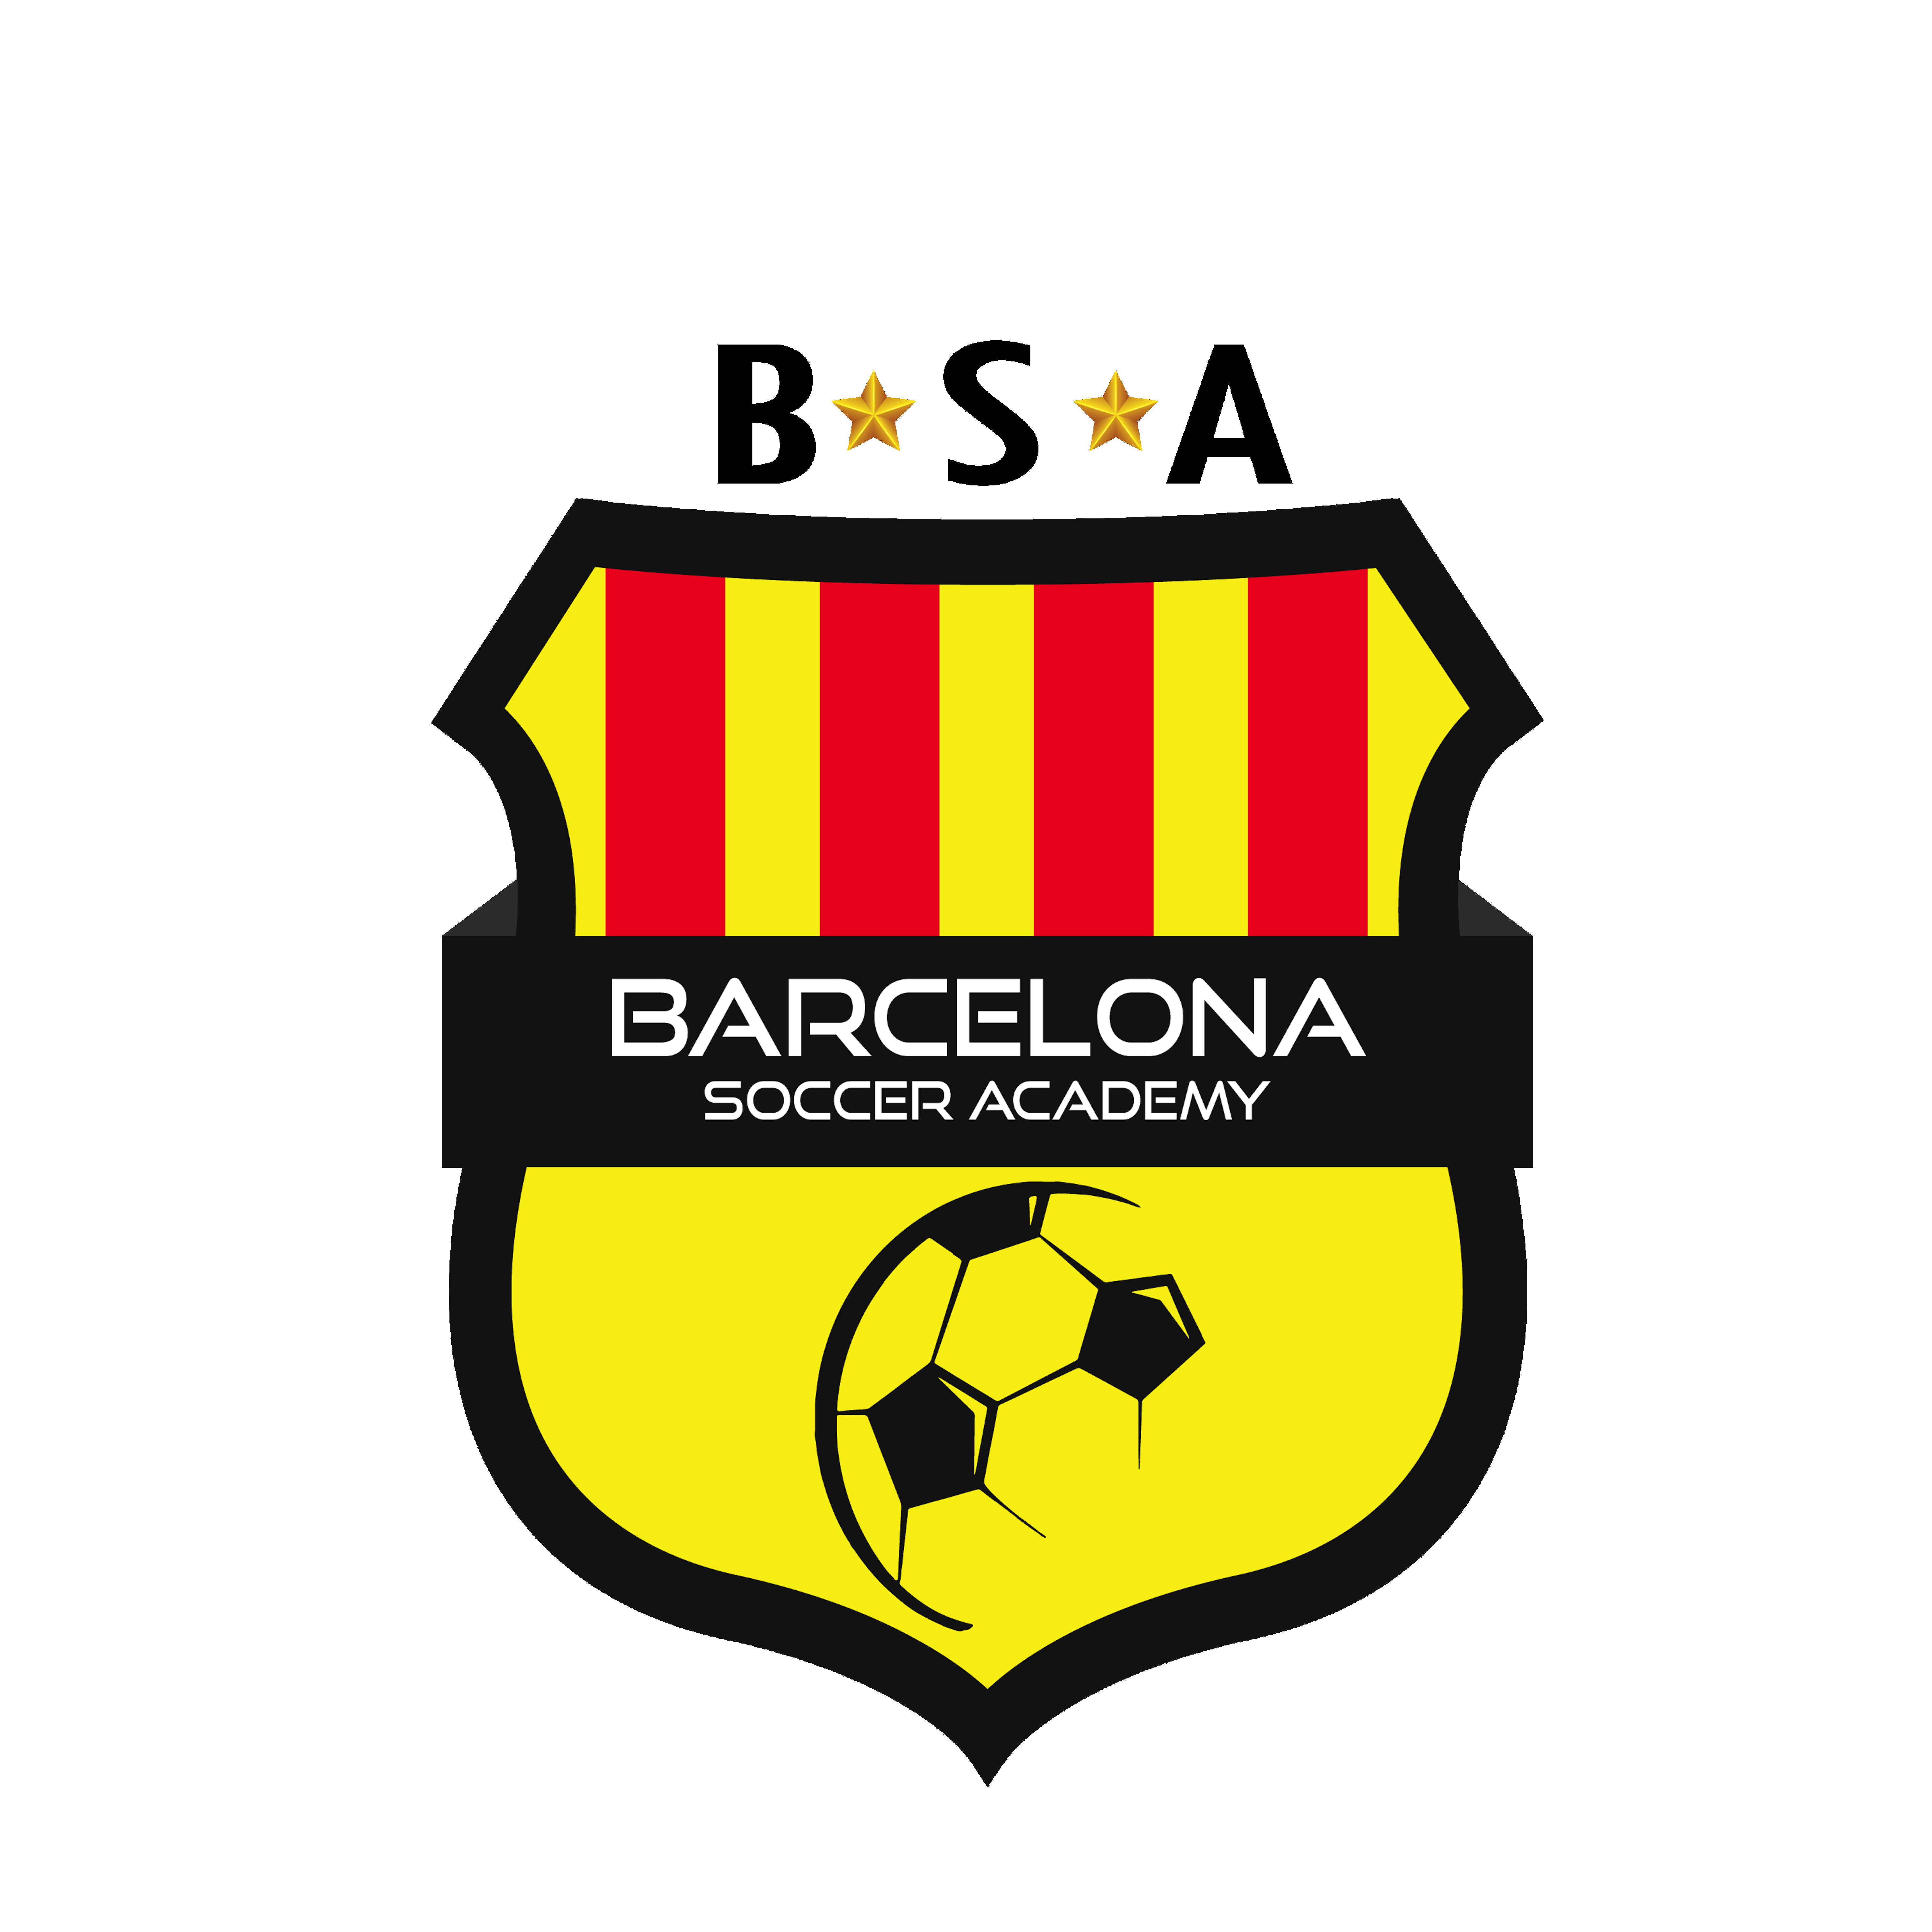 About Barcelona Soccer Academy Florida